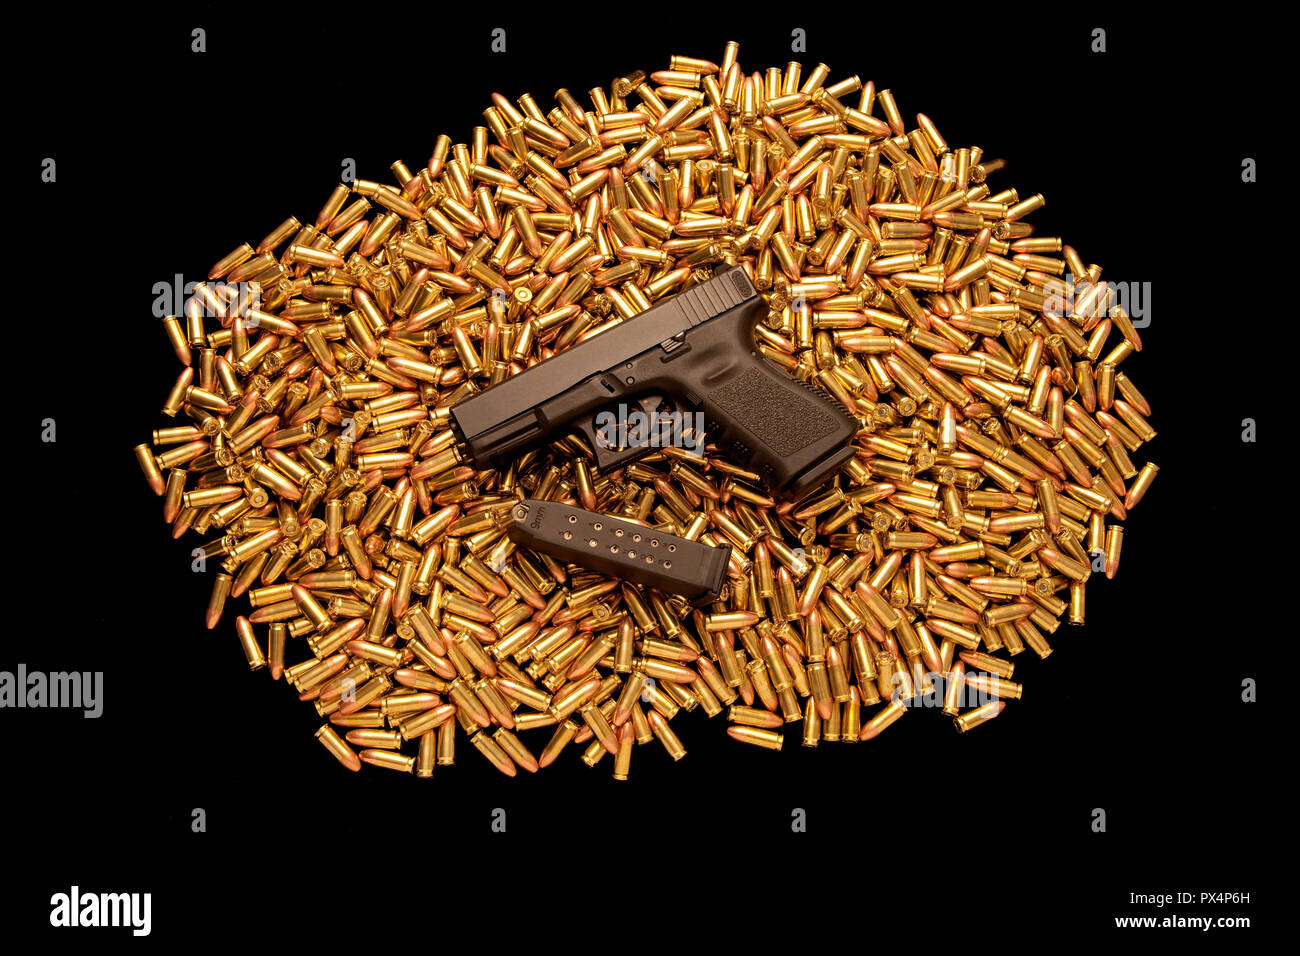 Loaded handgun resting on pile of live ammunition. - Stock Image